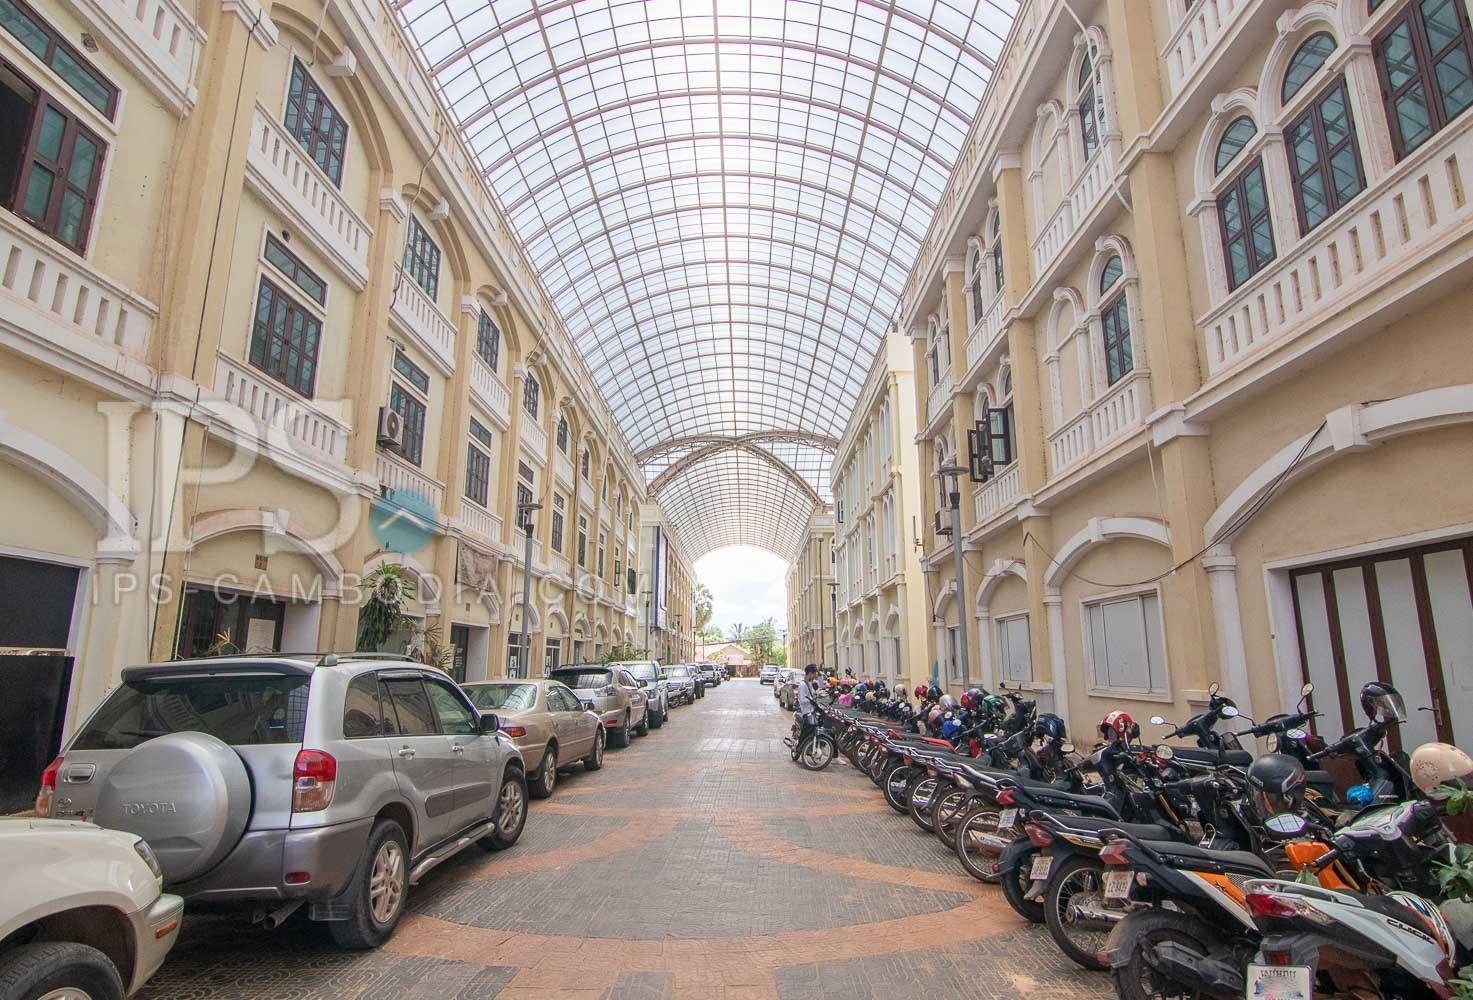 4 Bedroom Flat For Rent - Svay Dangkum, Siem Reap